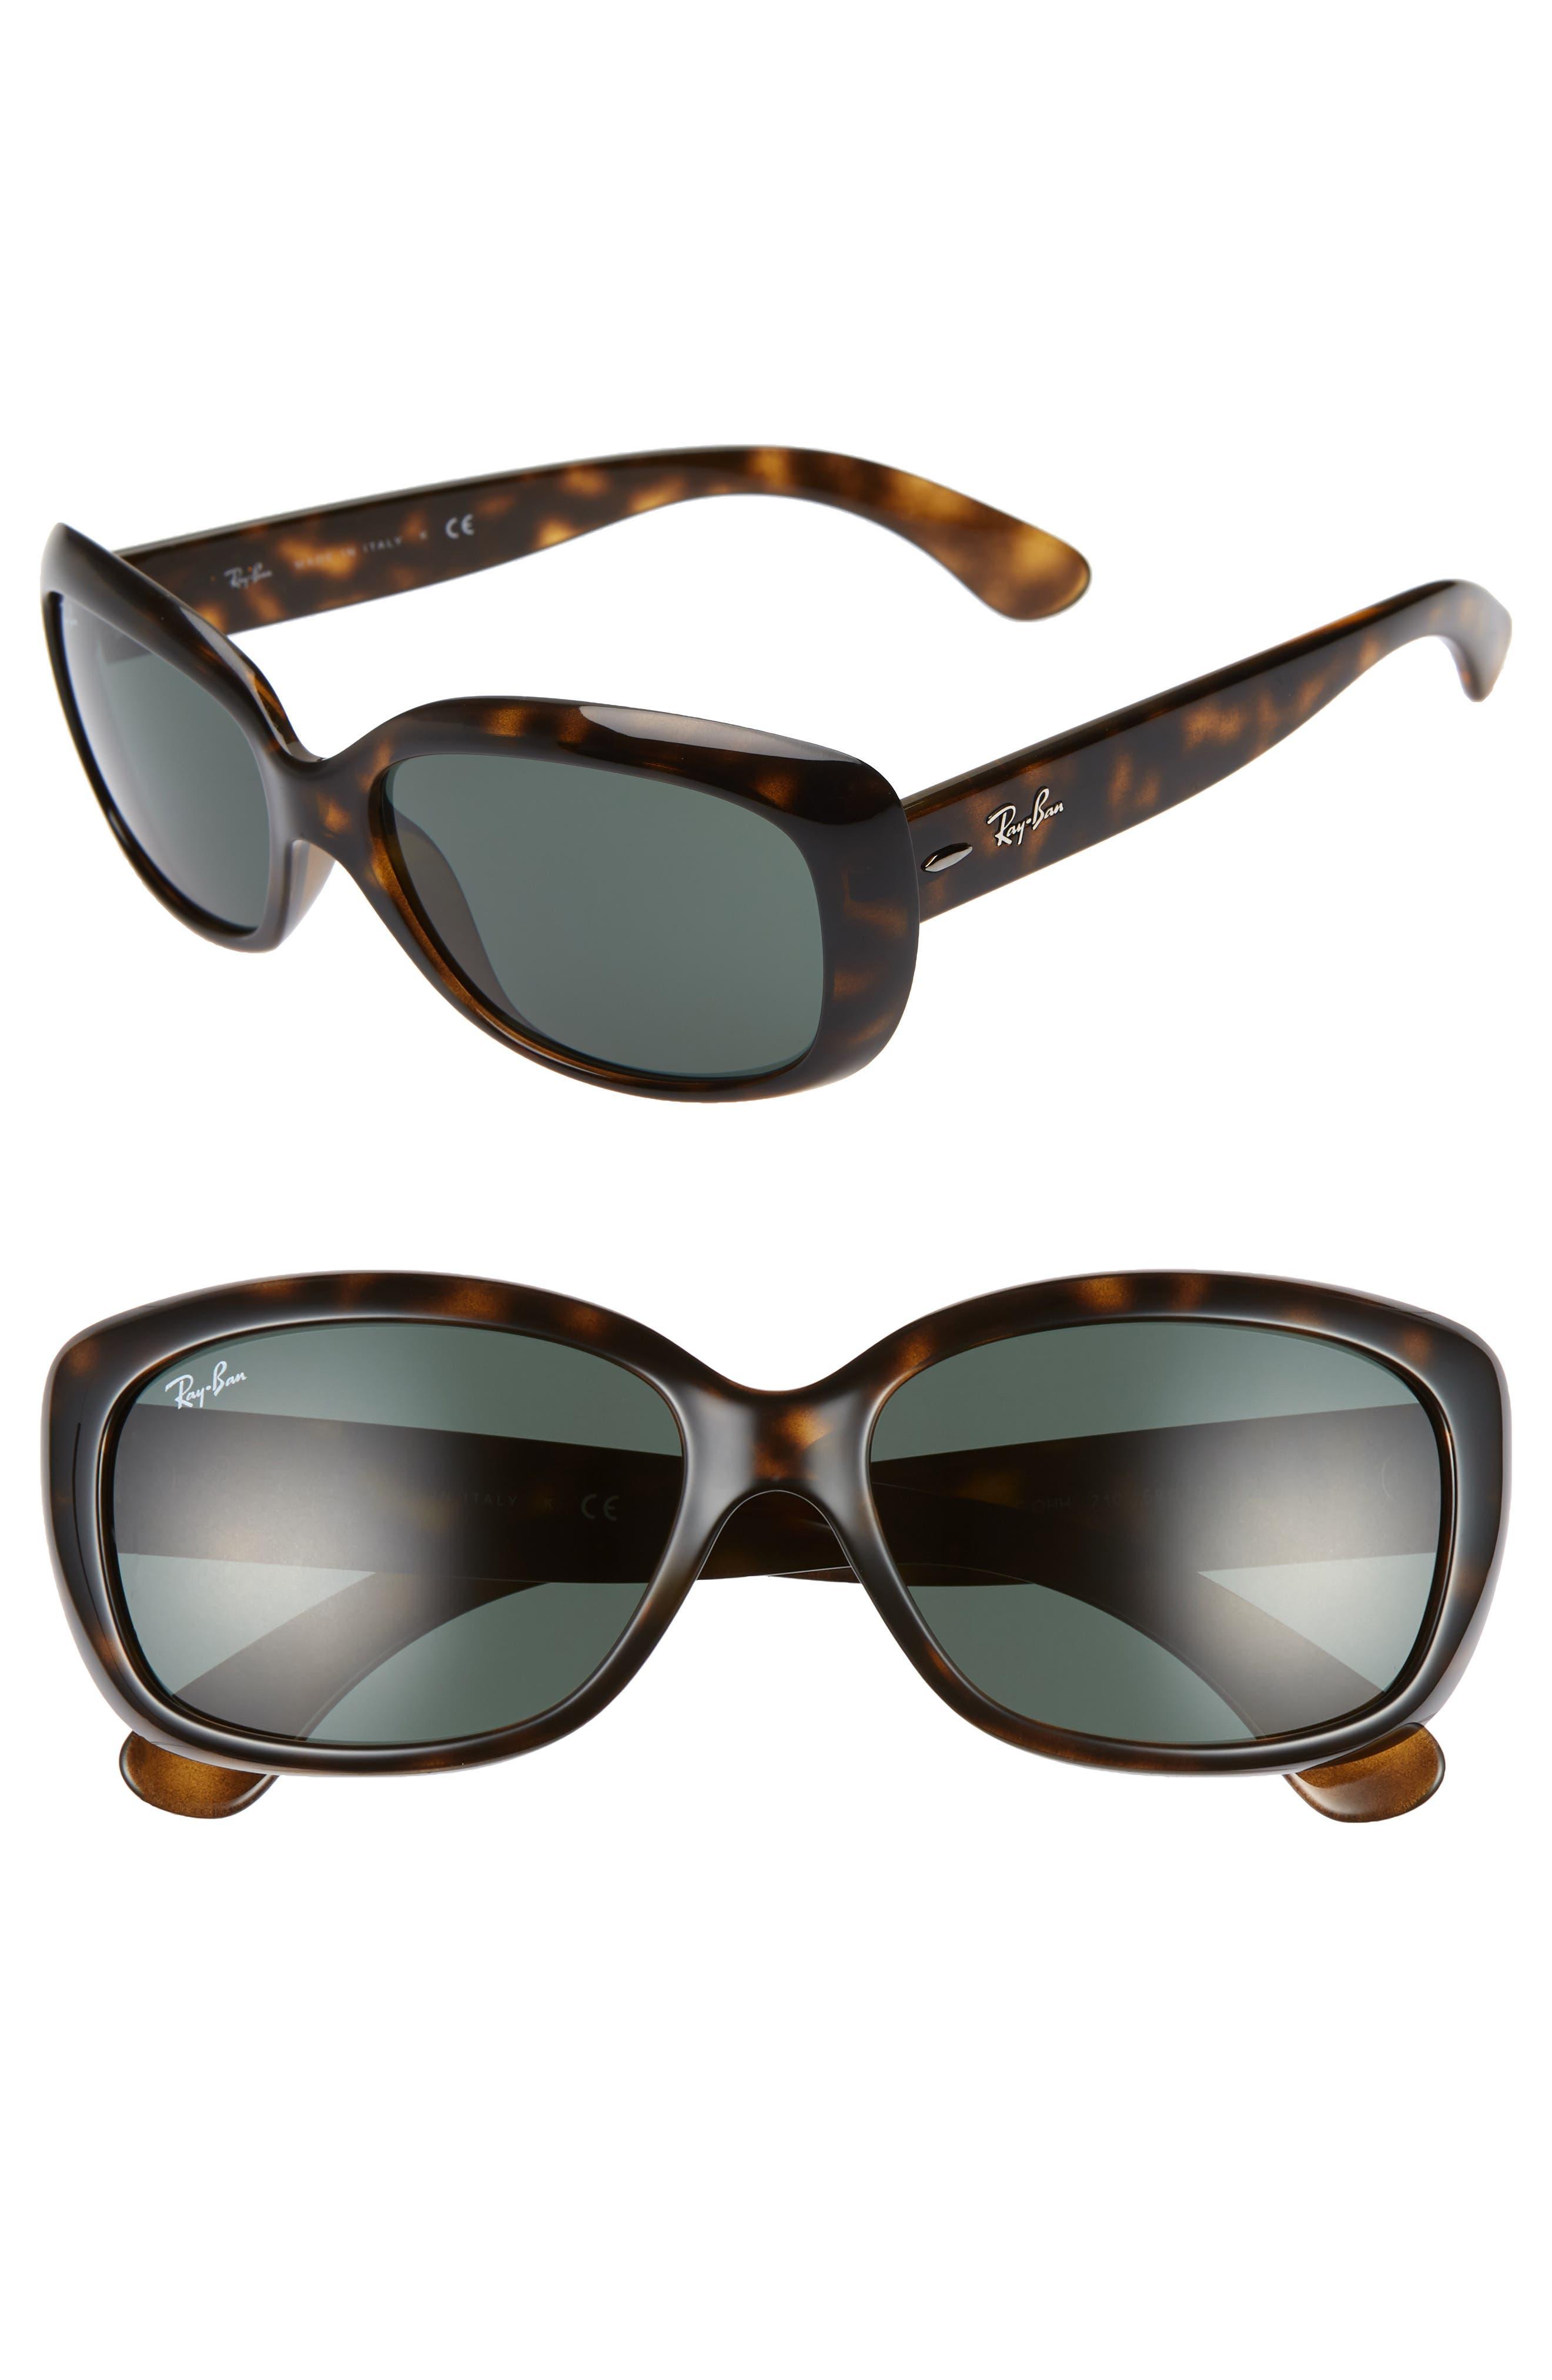 RAY-BAN Jackie Ohh 58mm Cat Eye Sunglasses, Main, color, LITE HAVANA/ GREEN SOLID